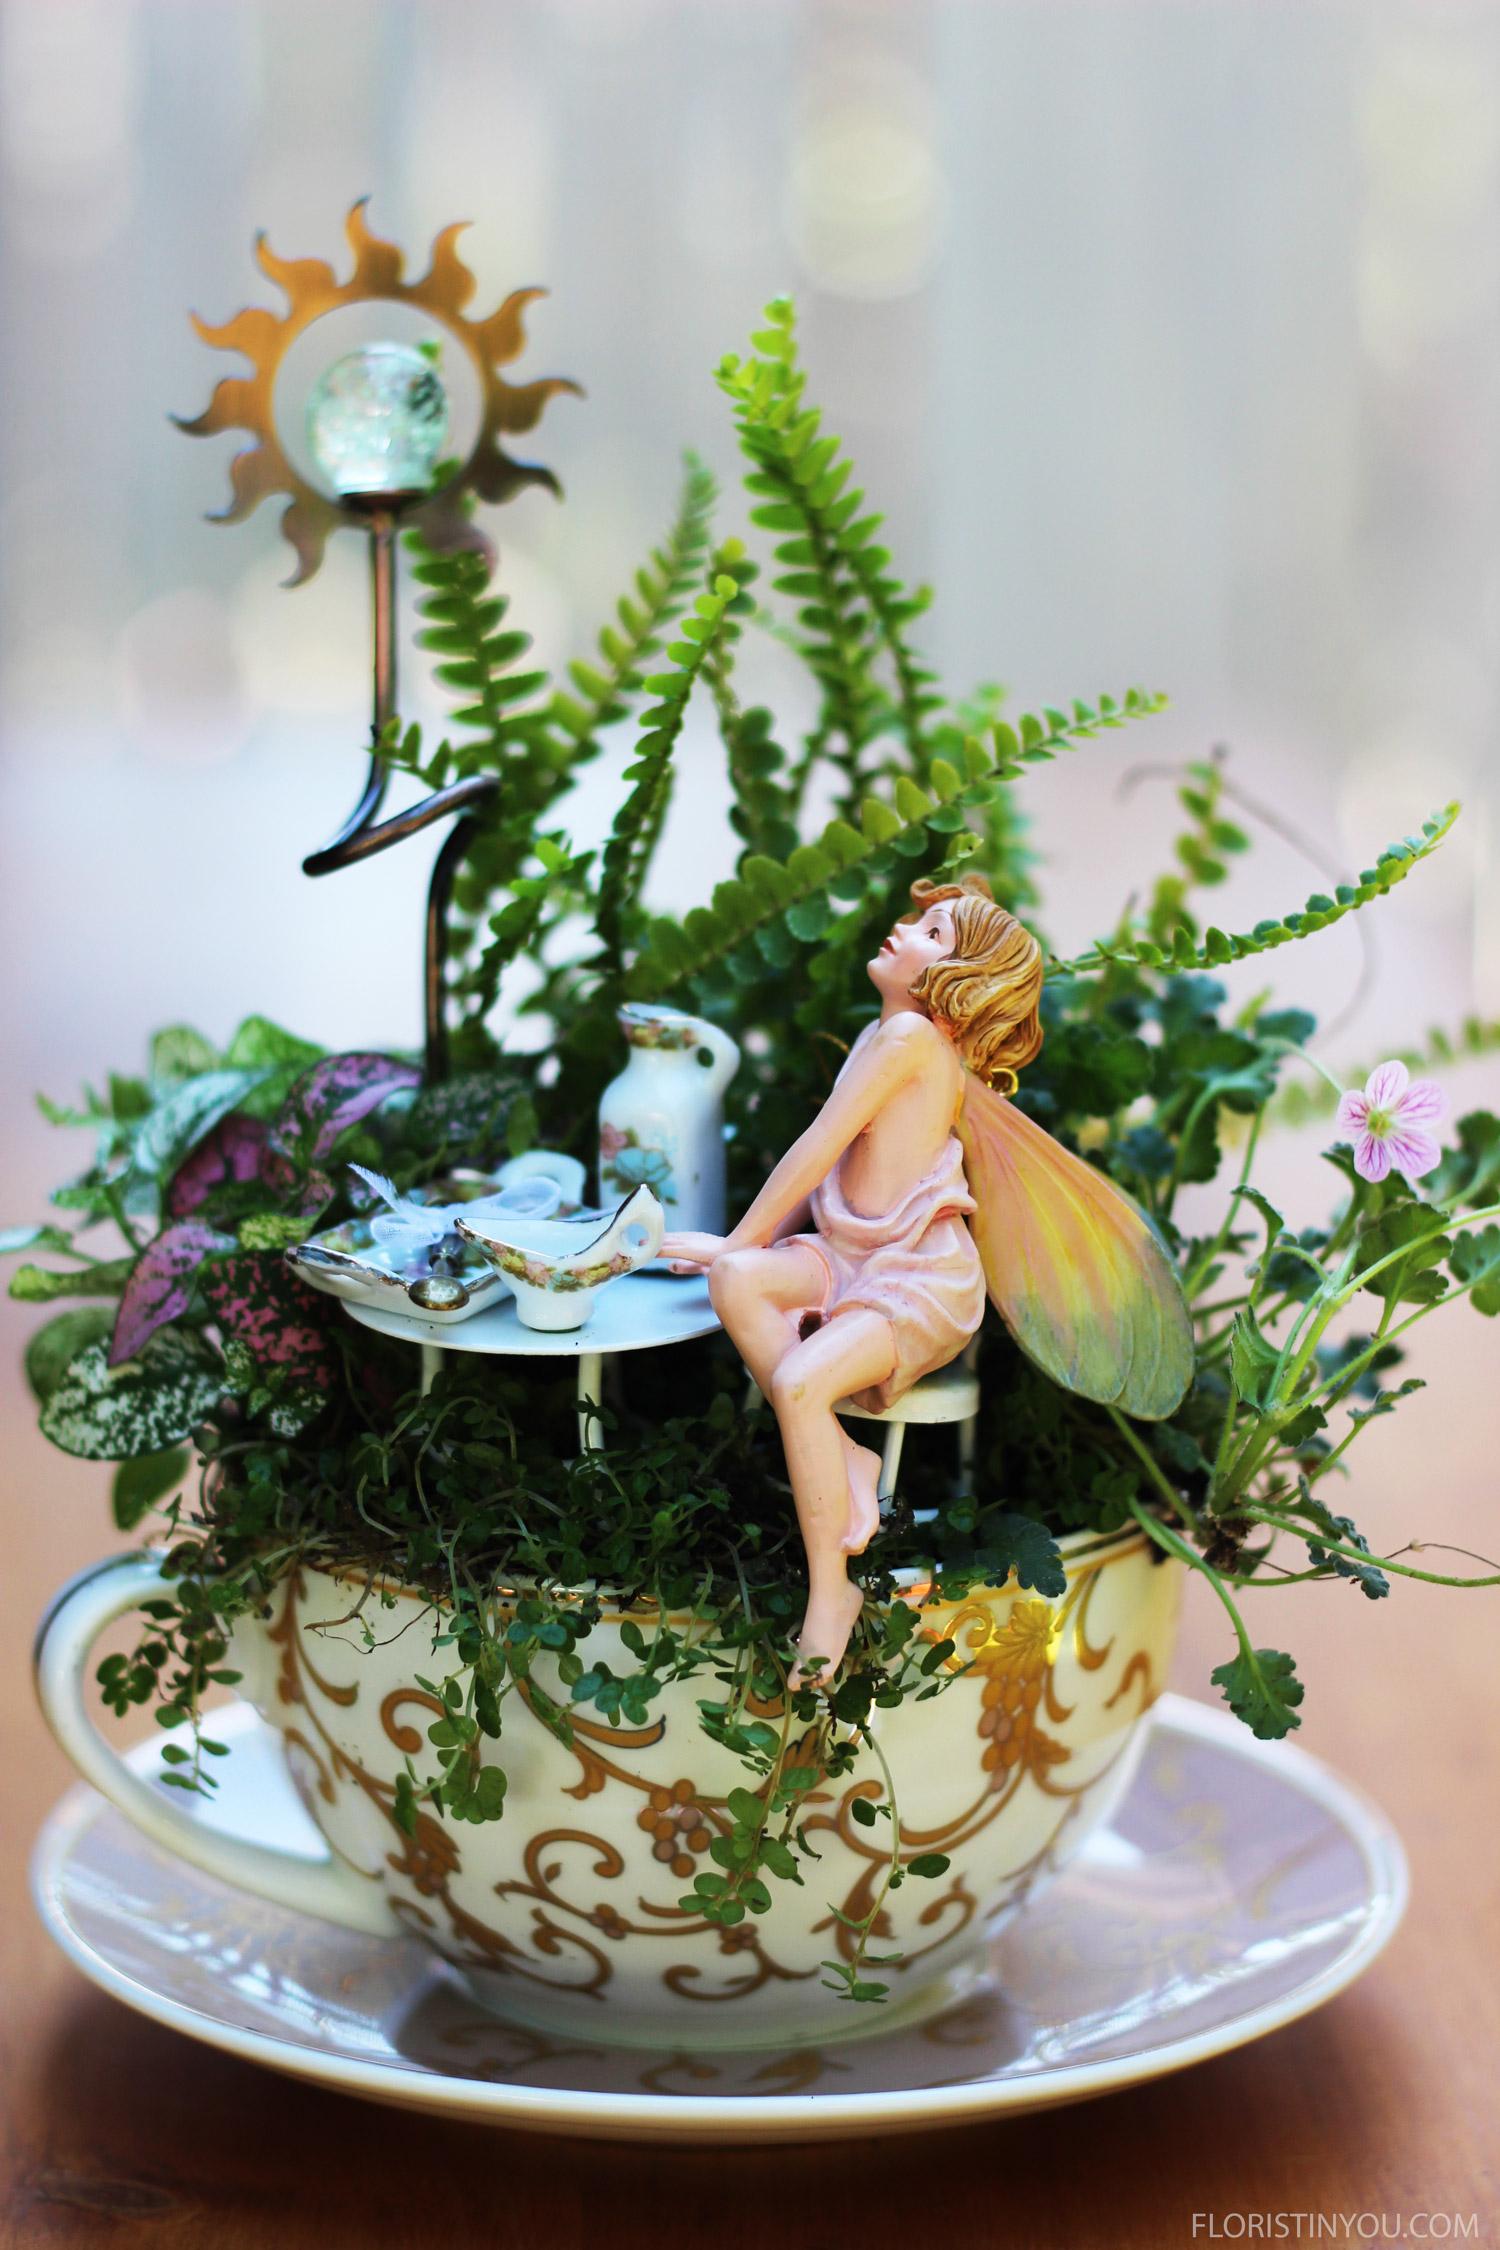 "How to Make a Teacup Fairy Garden                     Normal   0           false   false   false     EN-US   JA   X-NONE                                                                                                                                                                                                                                                                                                                                                                              /* Style Definitions */ table.MsoNormalTable {mso-style-name:""Table Normal""; mso-tstyle-rowband-size:0; mso-tstyle-colband-size:0; mso-style-noshow:yes; mso-style-priority:99; mso-style-parent:""""; mso-padding-alt:0in 5.4pt 0in 5.4pt; mso-para-margin:0in; mso-para-margin-bottom:.0001pt; mso-pagination:widow-orphan; font-size:12.0pt; font-family:Cambria; mso-ascii-font-family:Cambria; mso-ascii-theme-font:minor-latin; mso-hansi-font-family:Cambria; mso-hansi-theme-font:minor-latin;}"